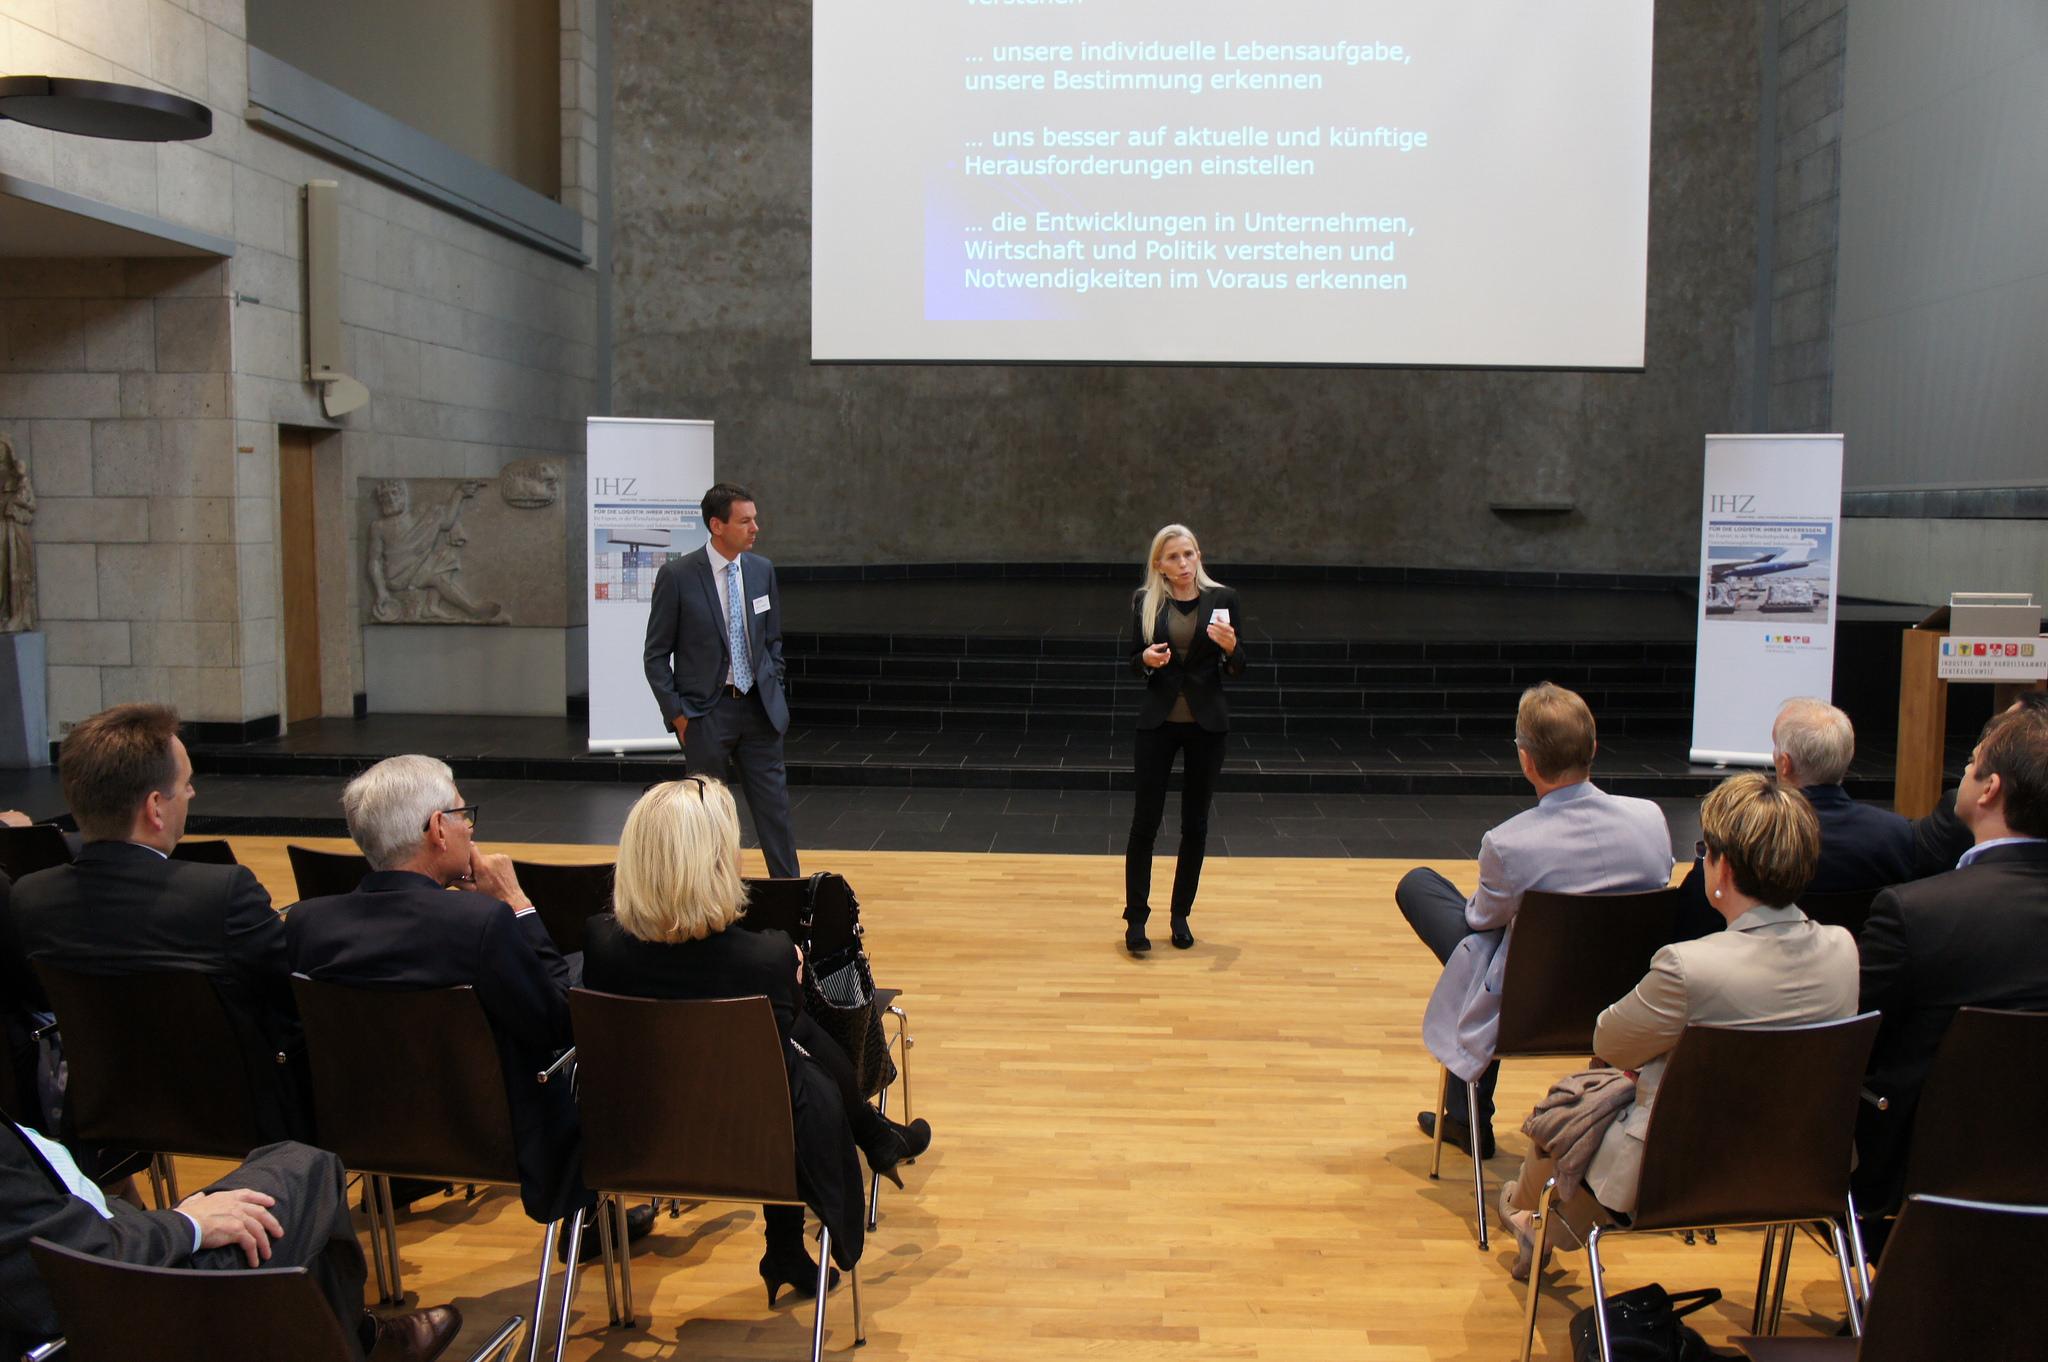 Events_Referate_Handelskammer_Zentralschweiz_rechts